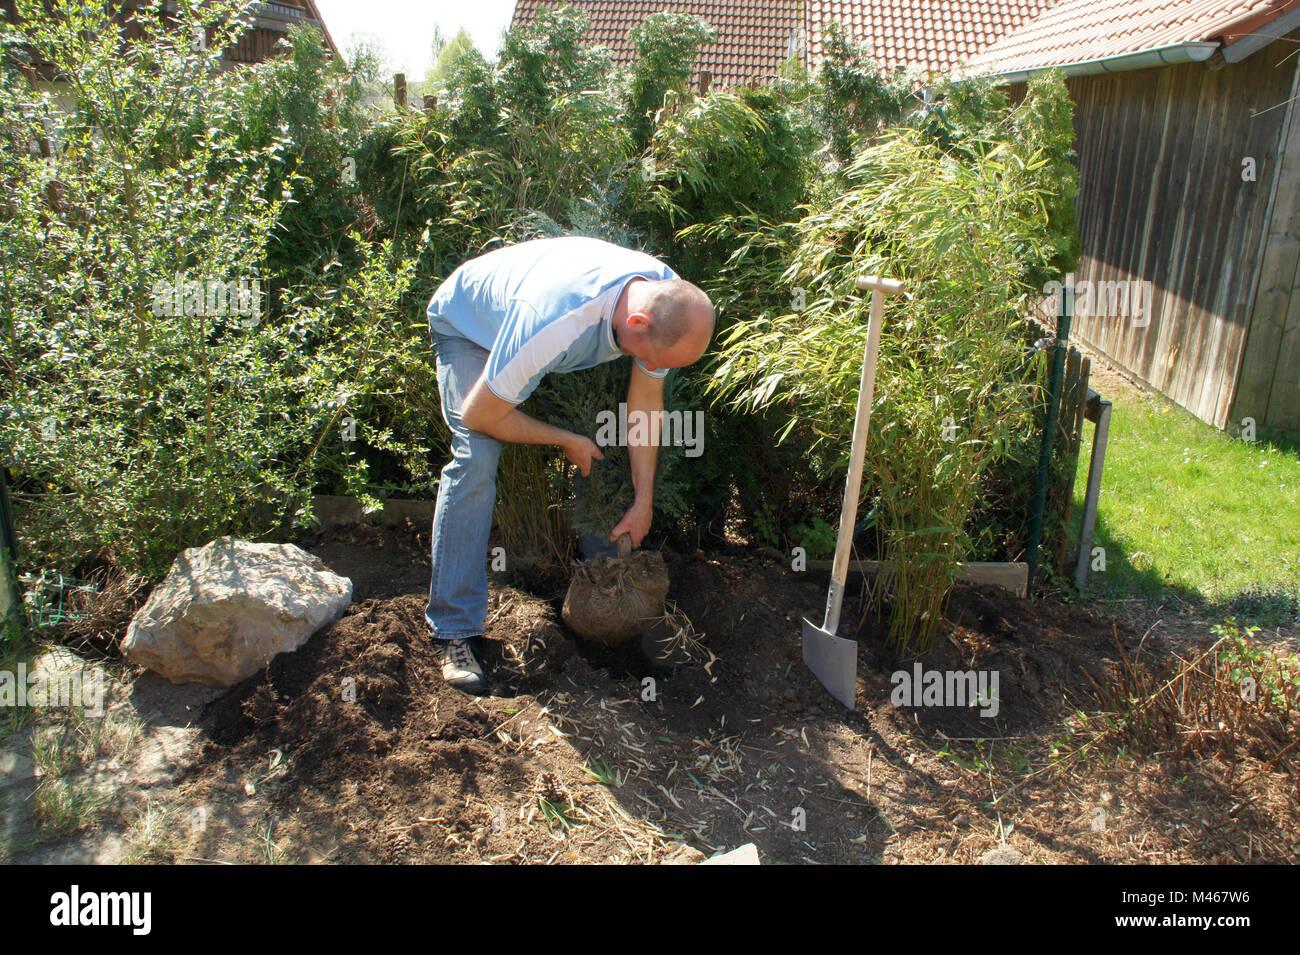 Chamaecyparis lawsoniana, planting lawsons cypress - Stock Image